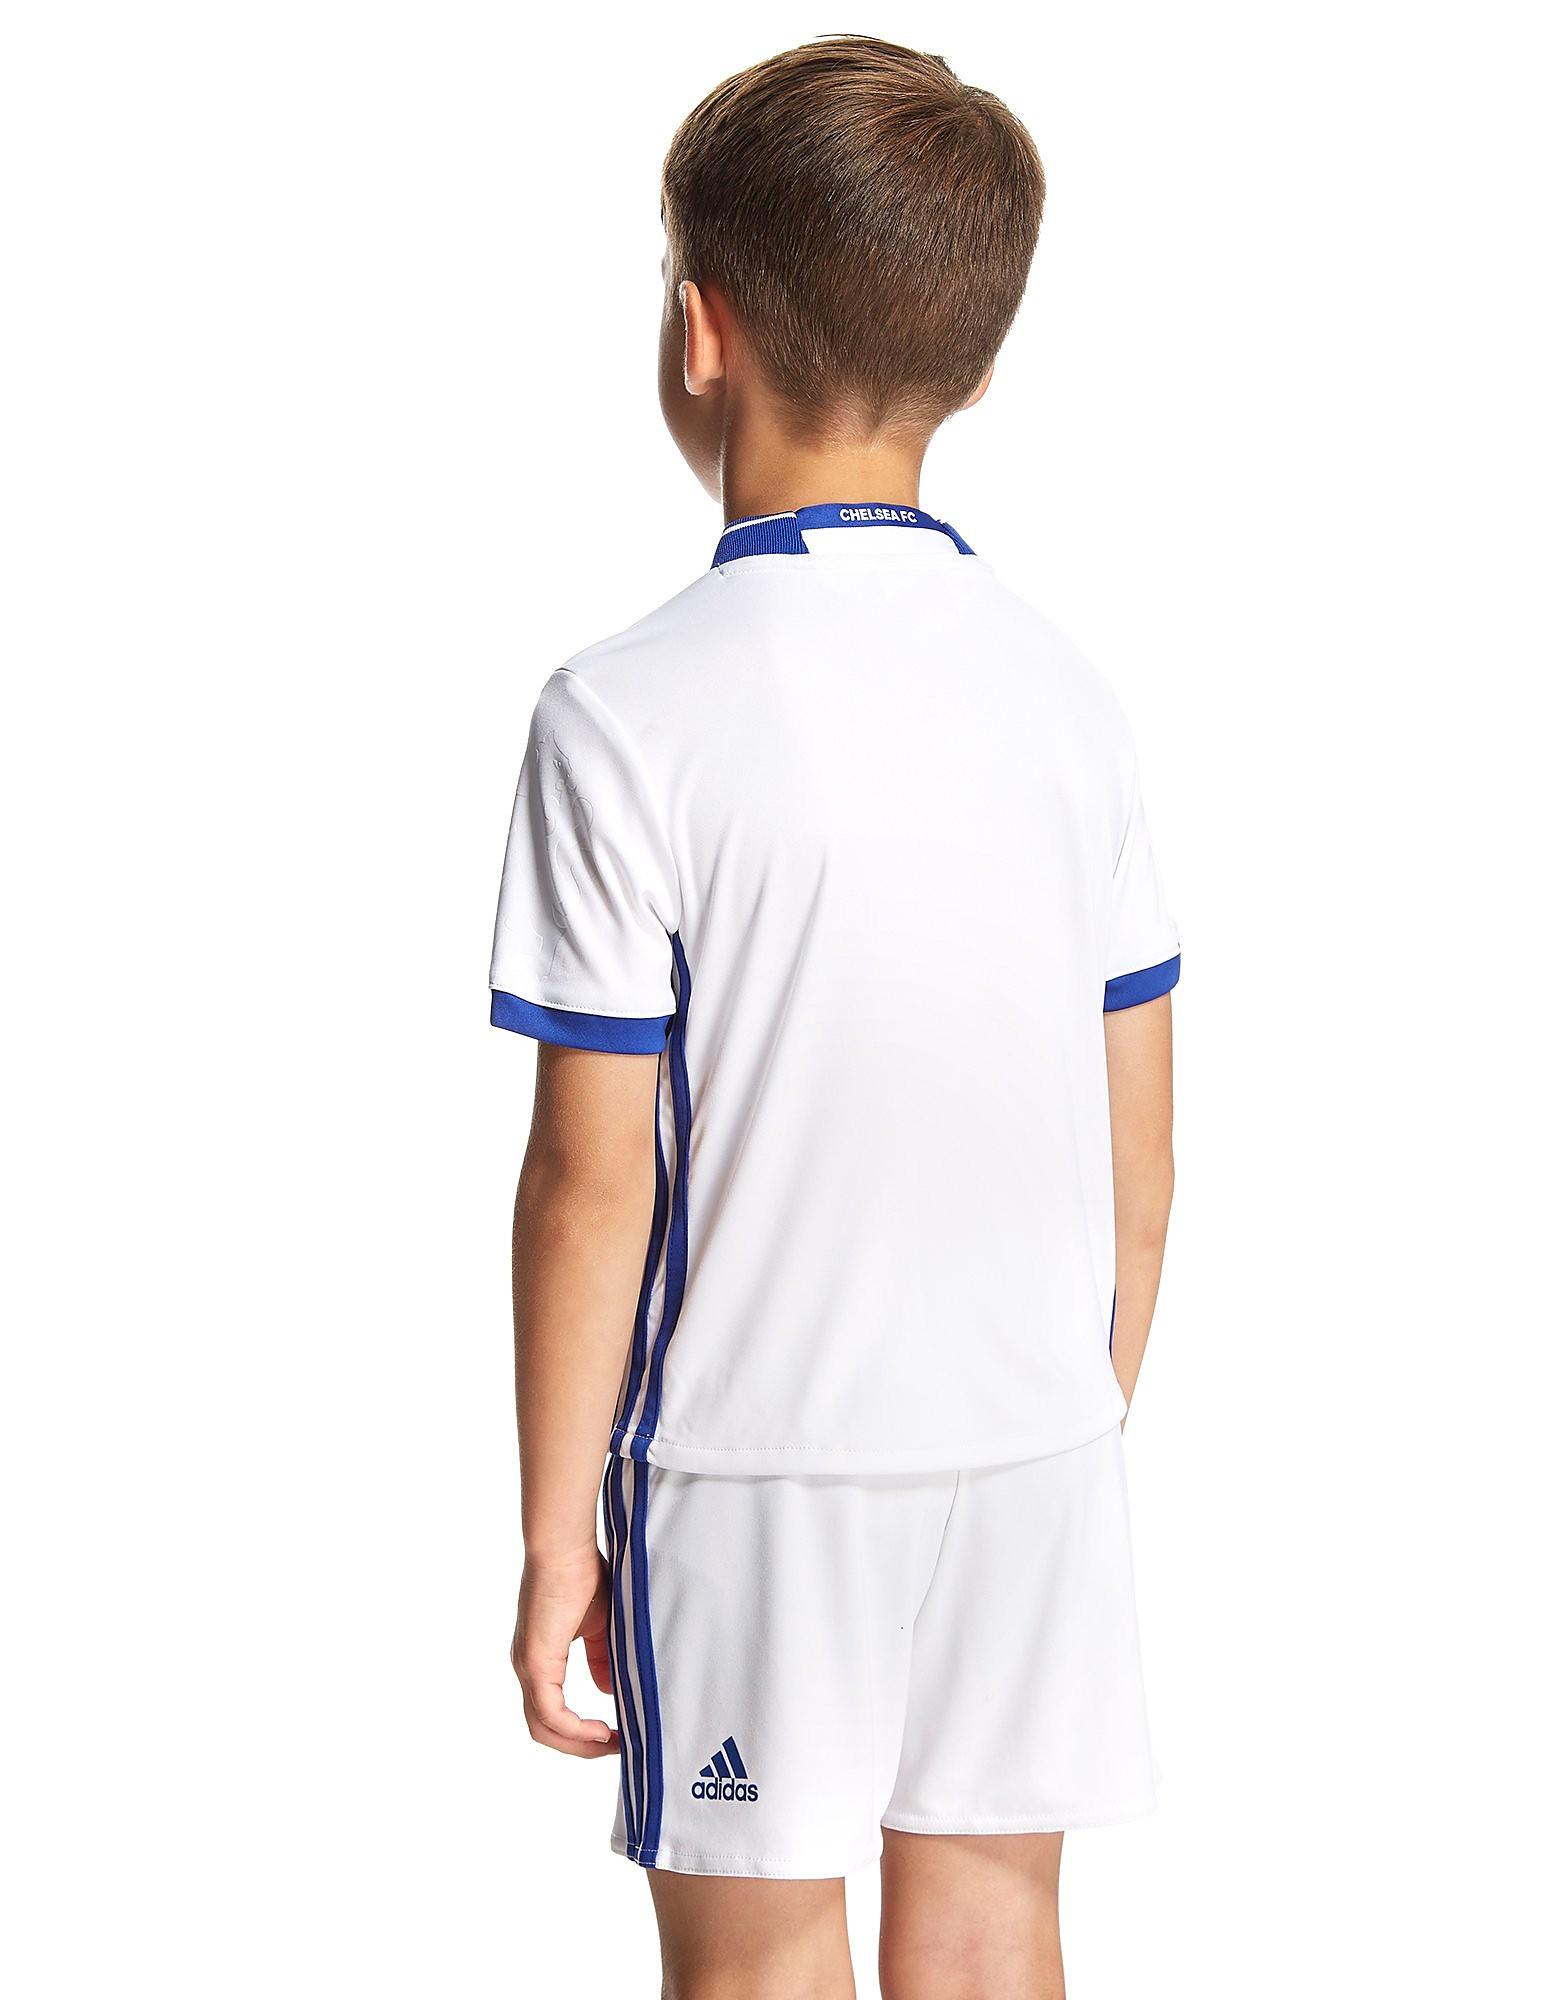 adidas Chelsea FC 2016/17 Third Kit Children